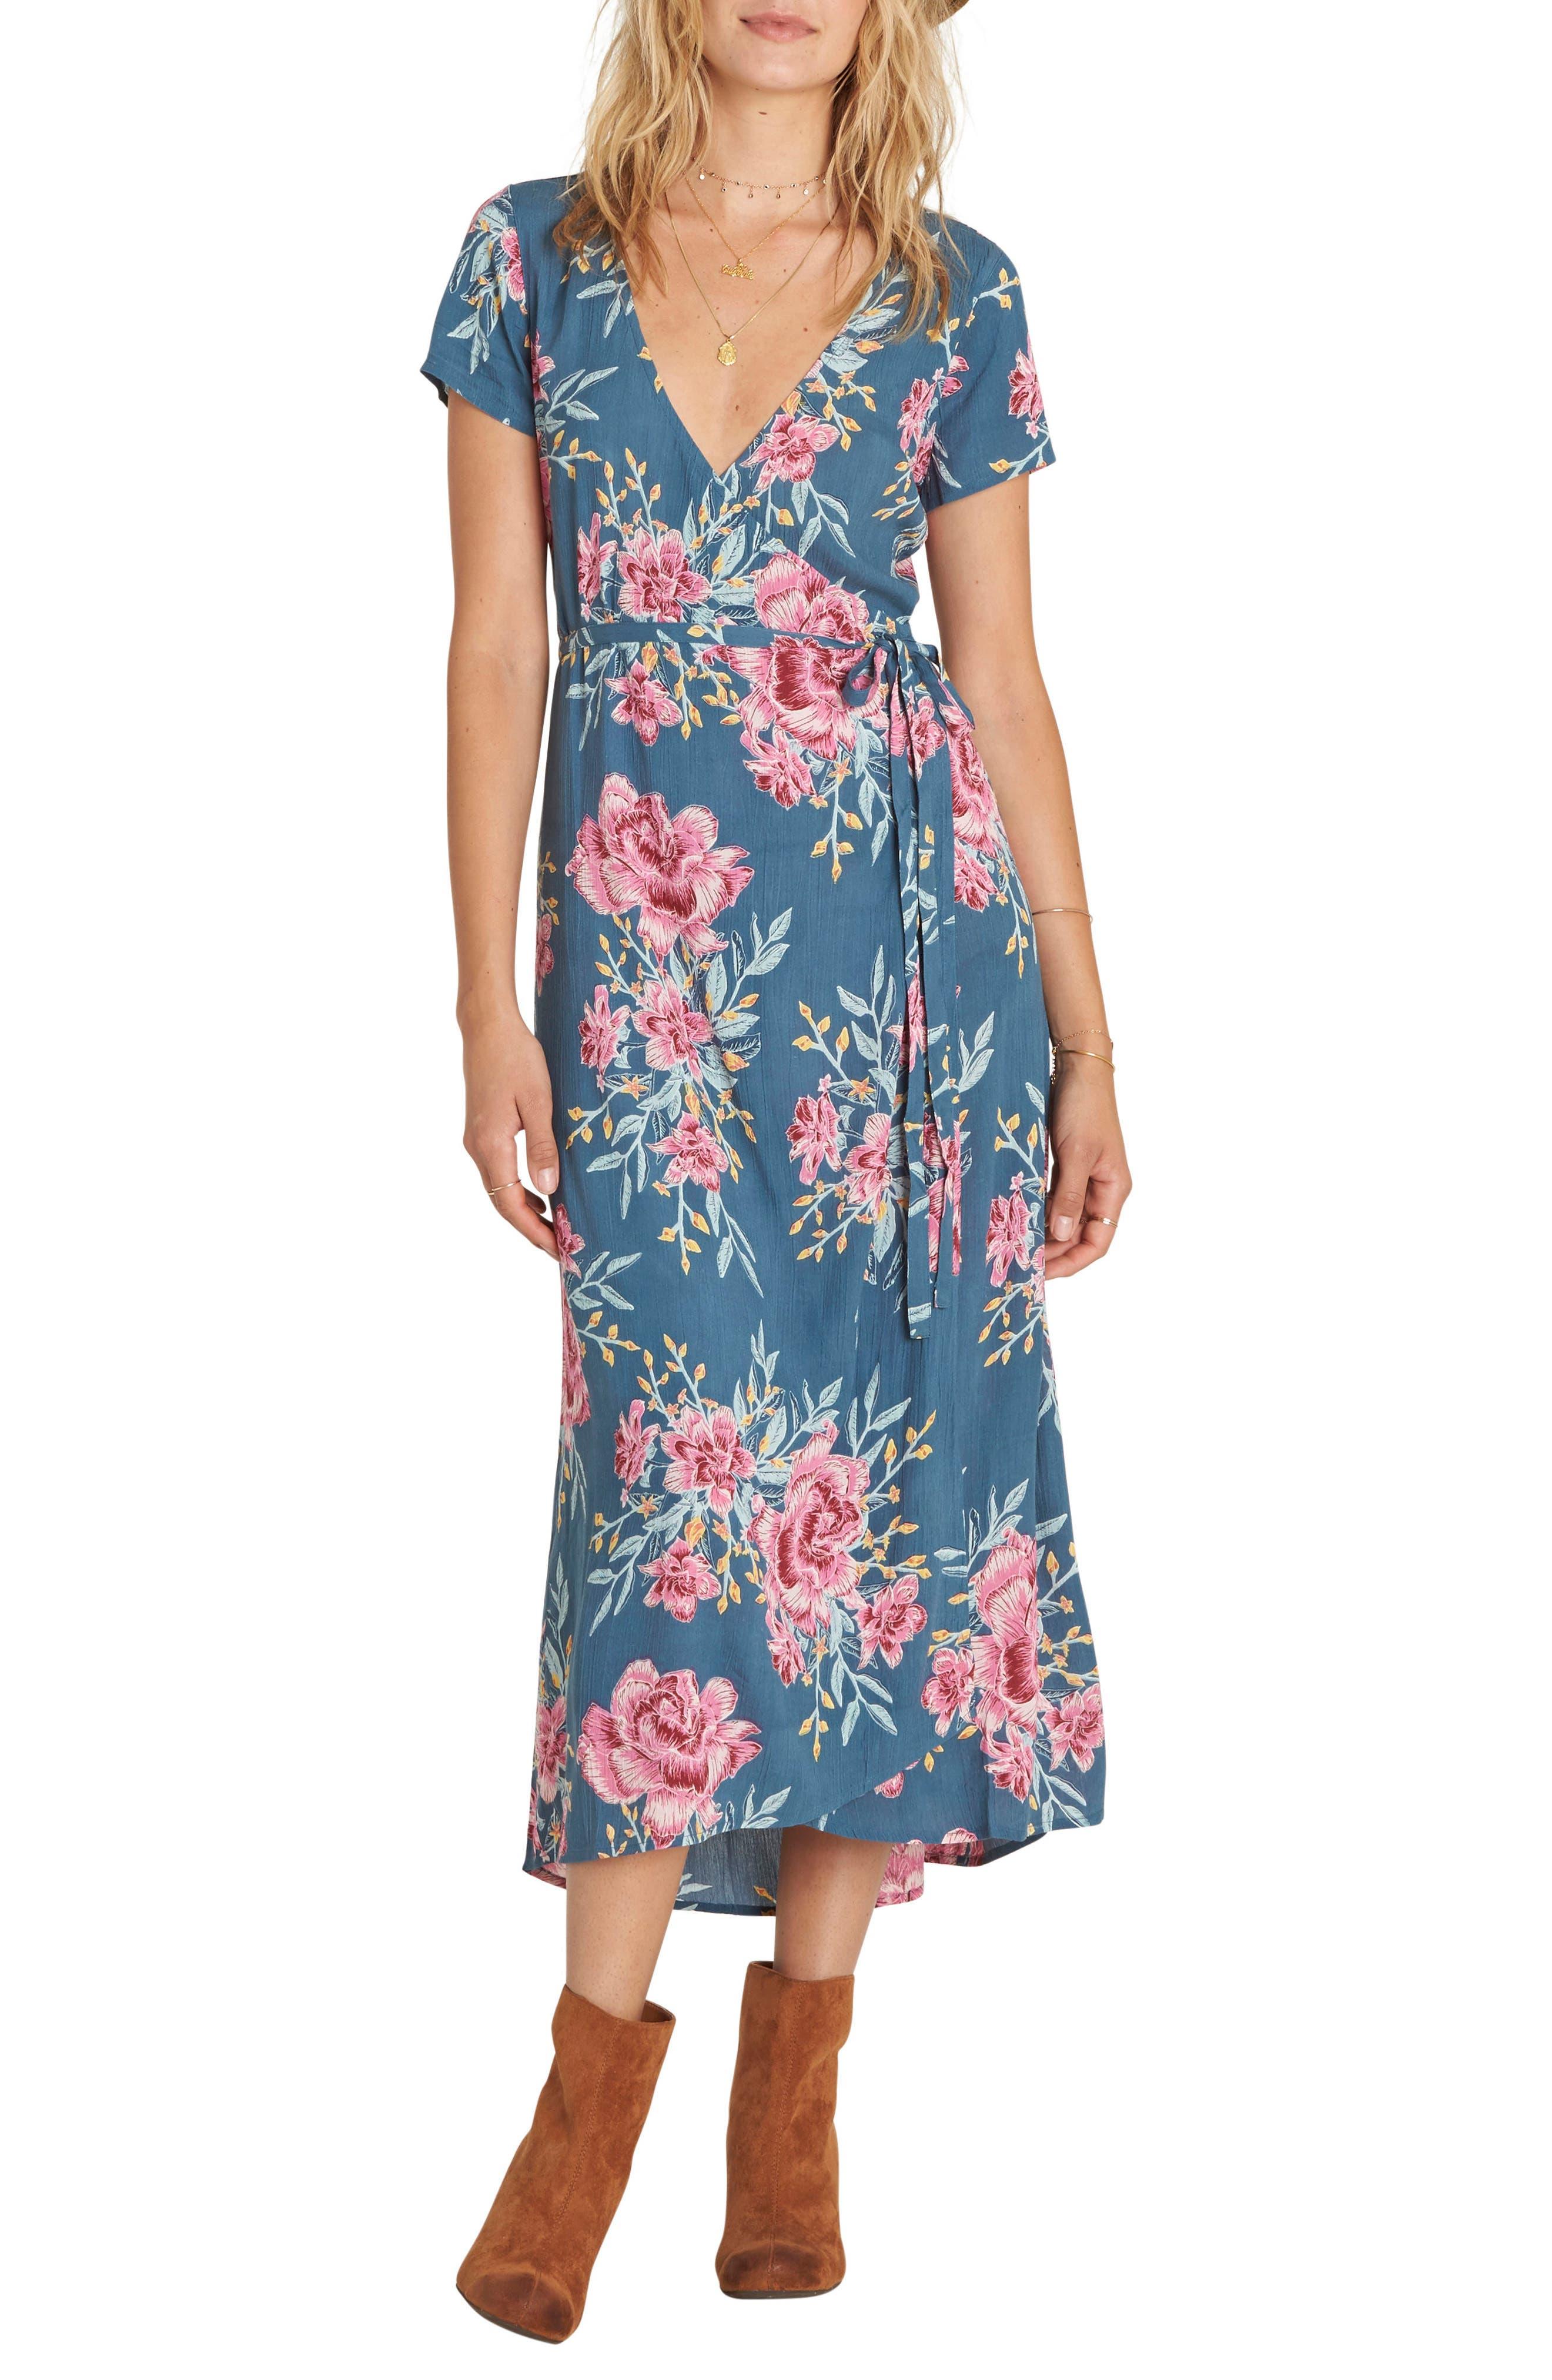 Alternate Image 1 Selected - Billabong Wrap Me Up Floral Print Wrap Dress